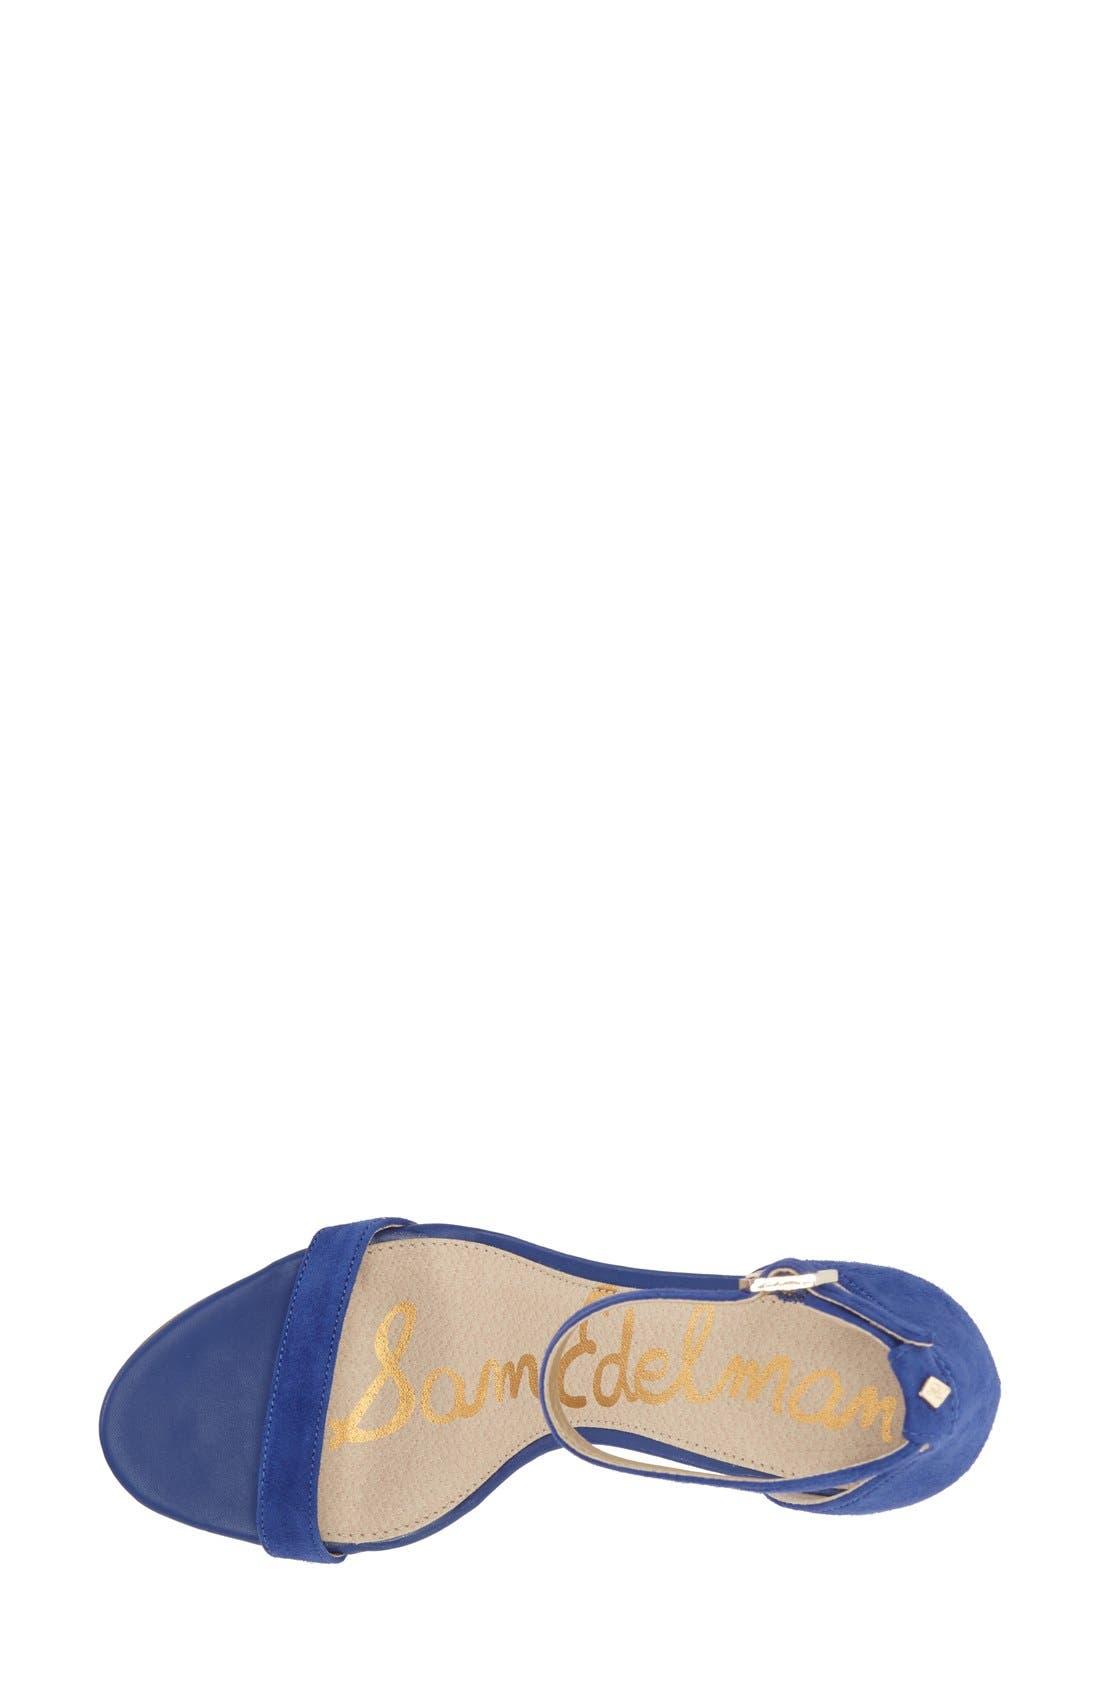 ,                             'Patti' Ankle Strap Sandal,                             Alternate thumbnail 196, color,                             402